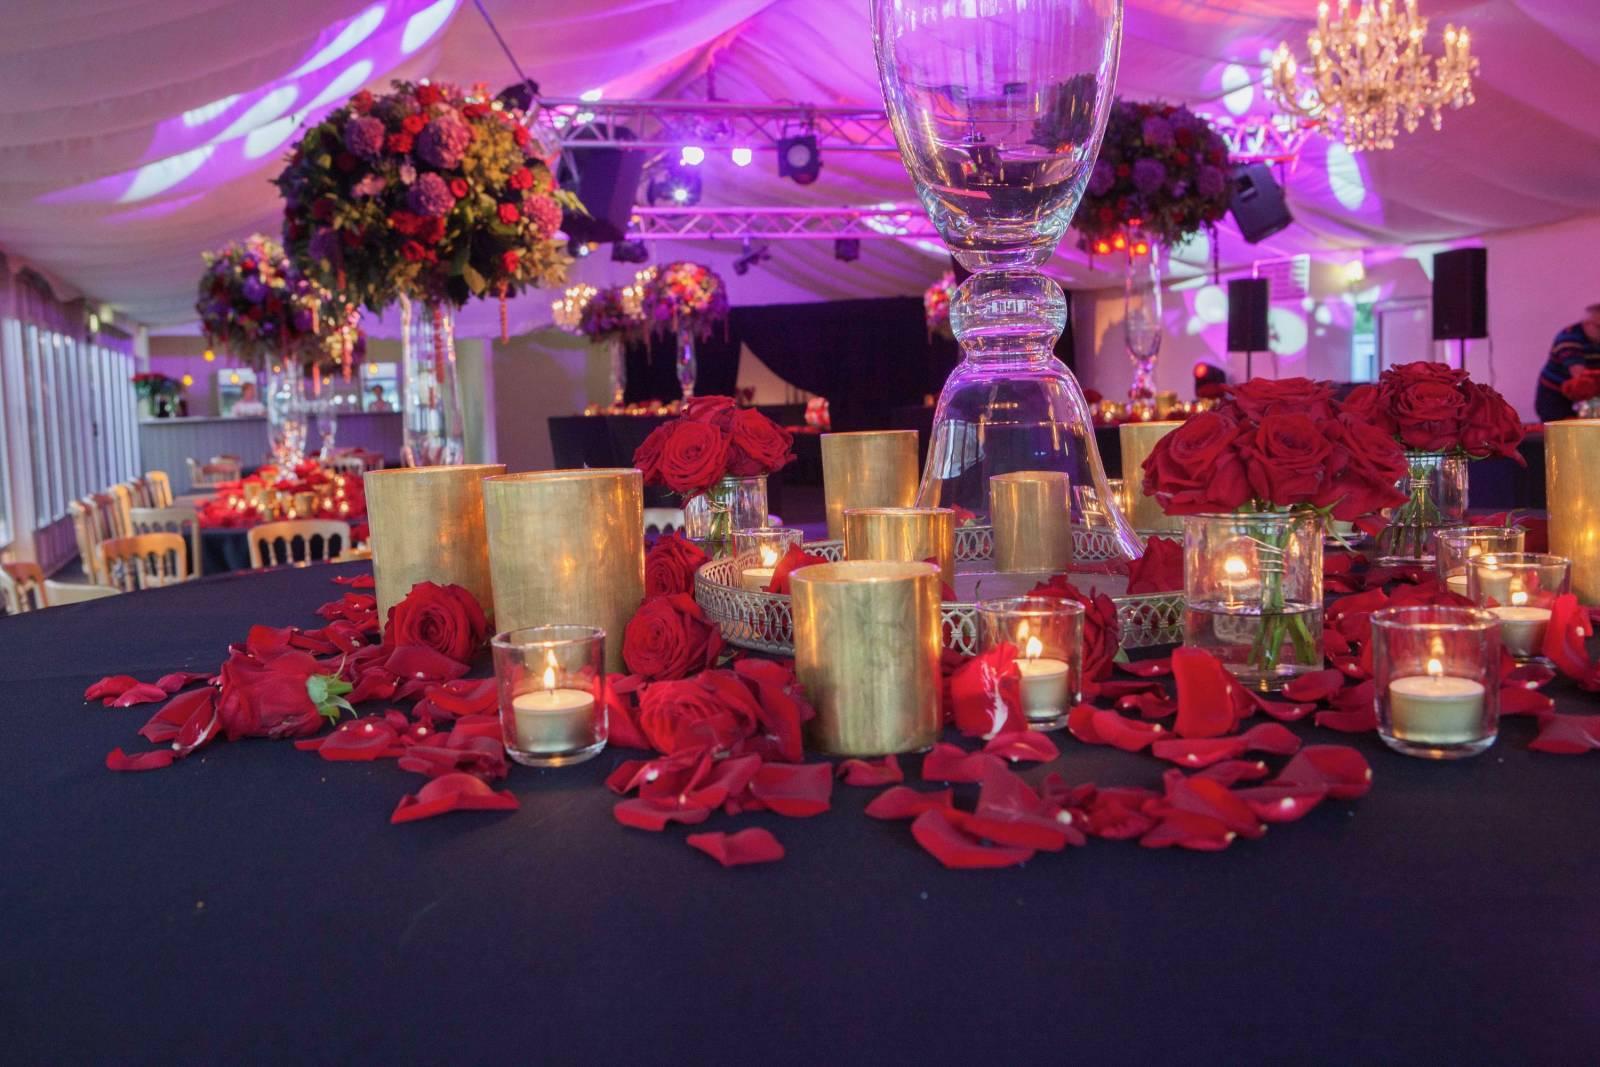 Carpe Diem Bloemen & Decoratie - House of Weddings  - 50